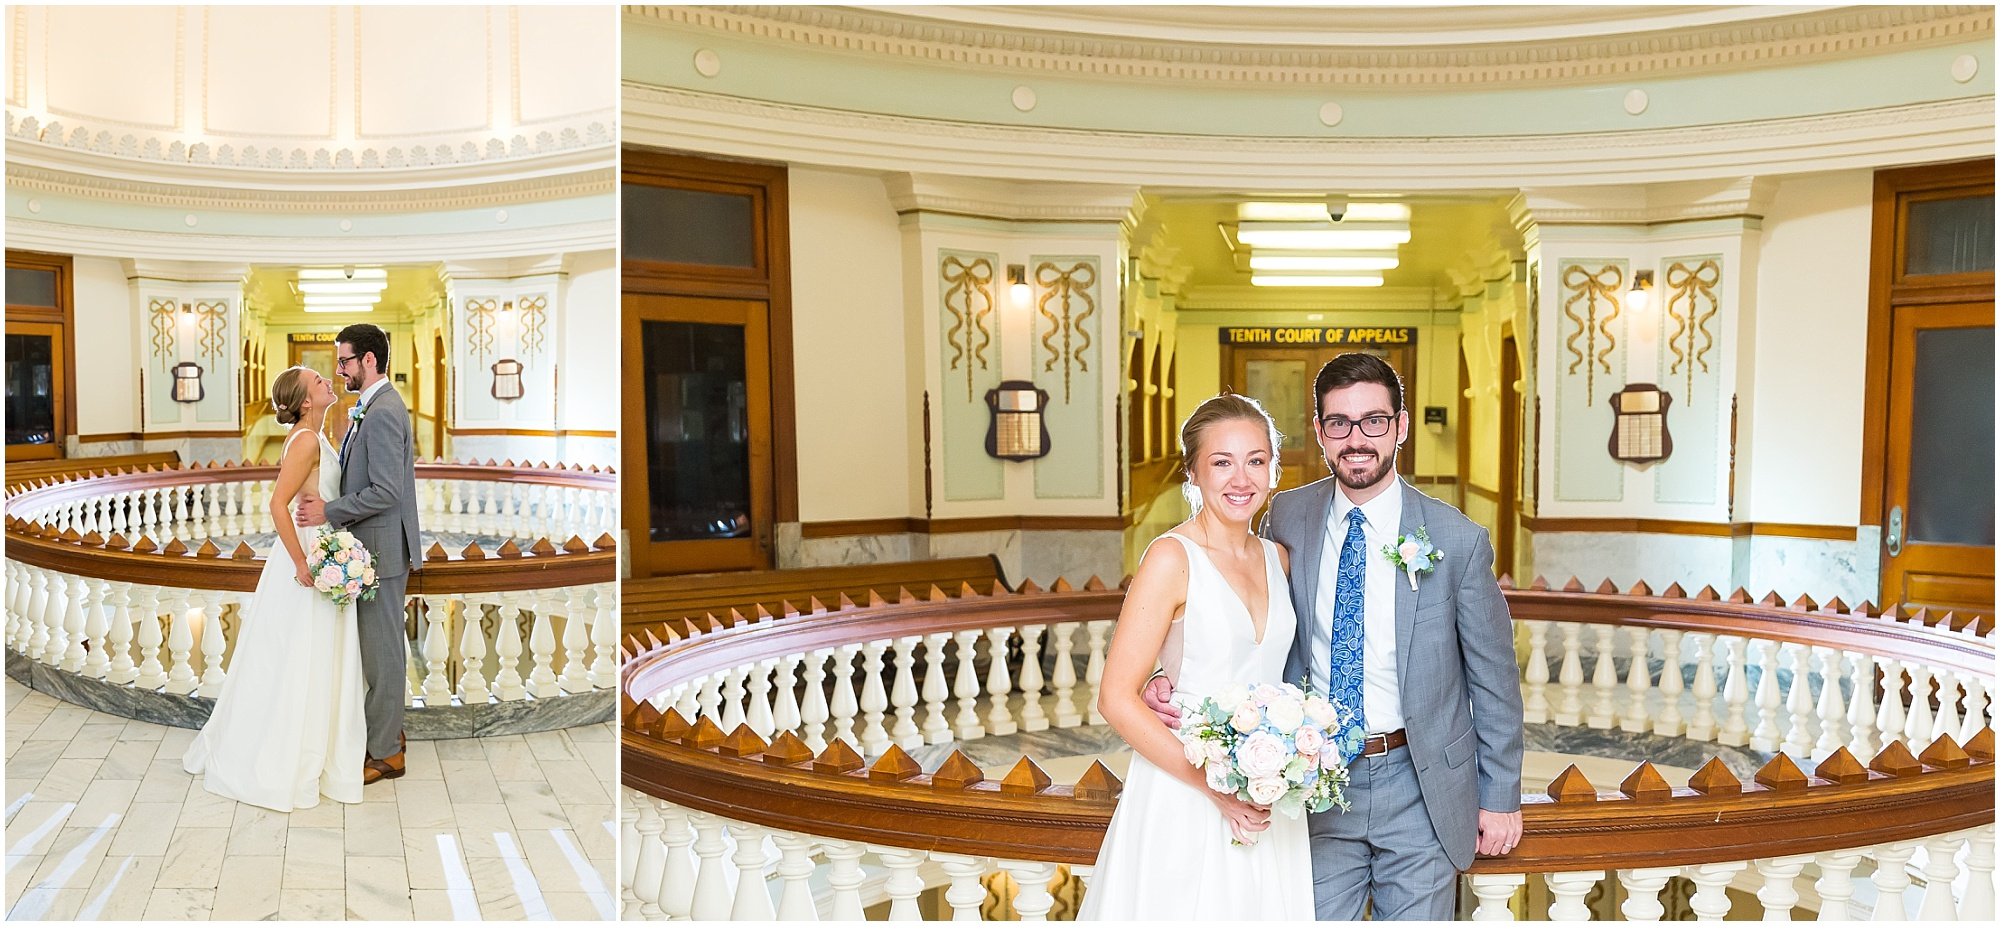 Courthouse-Wedding-Waco-Texas_0022.jpg